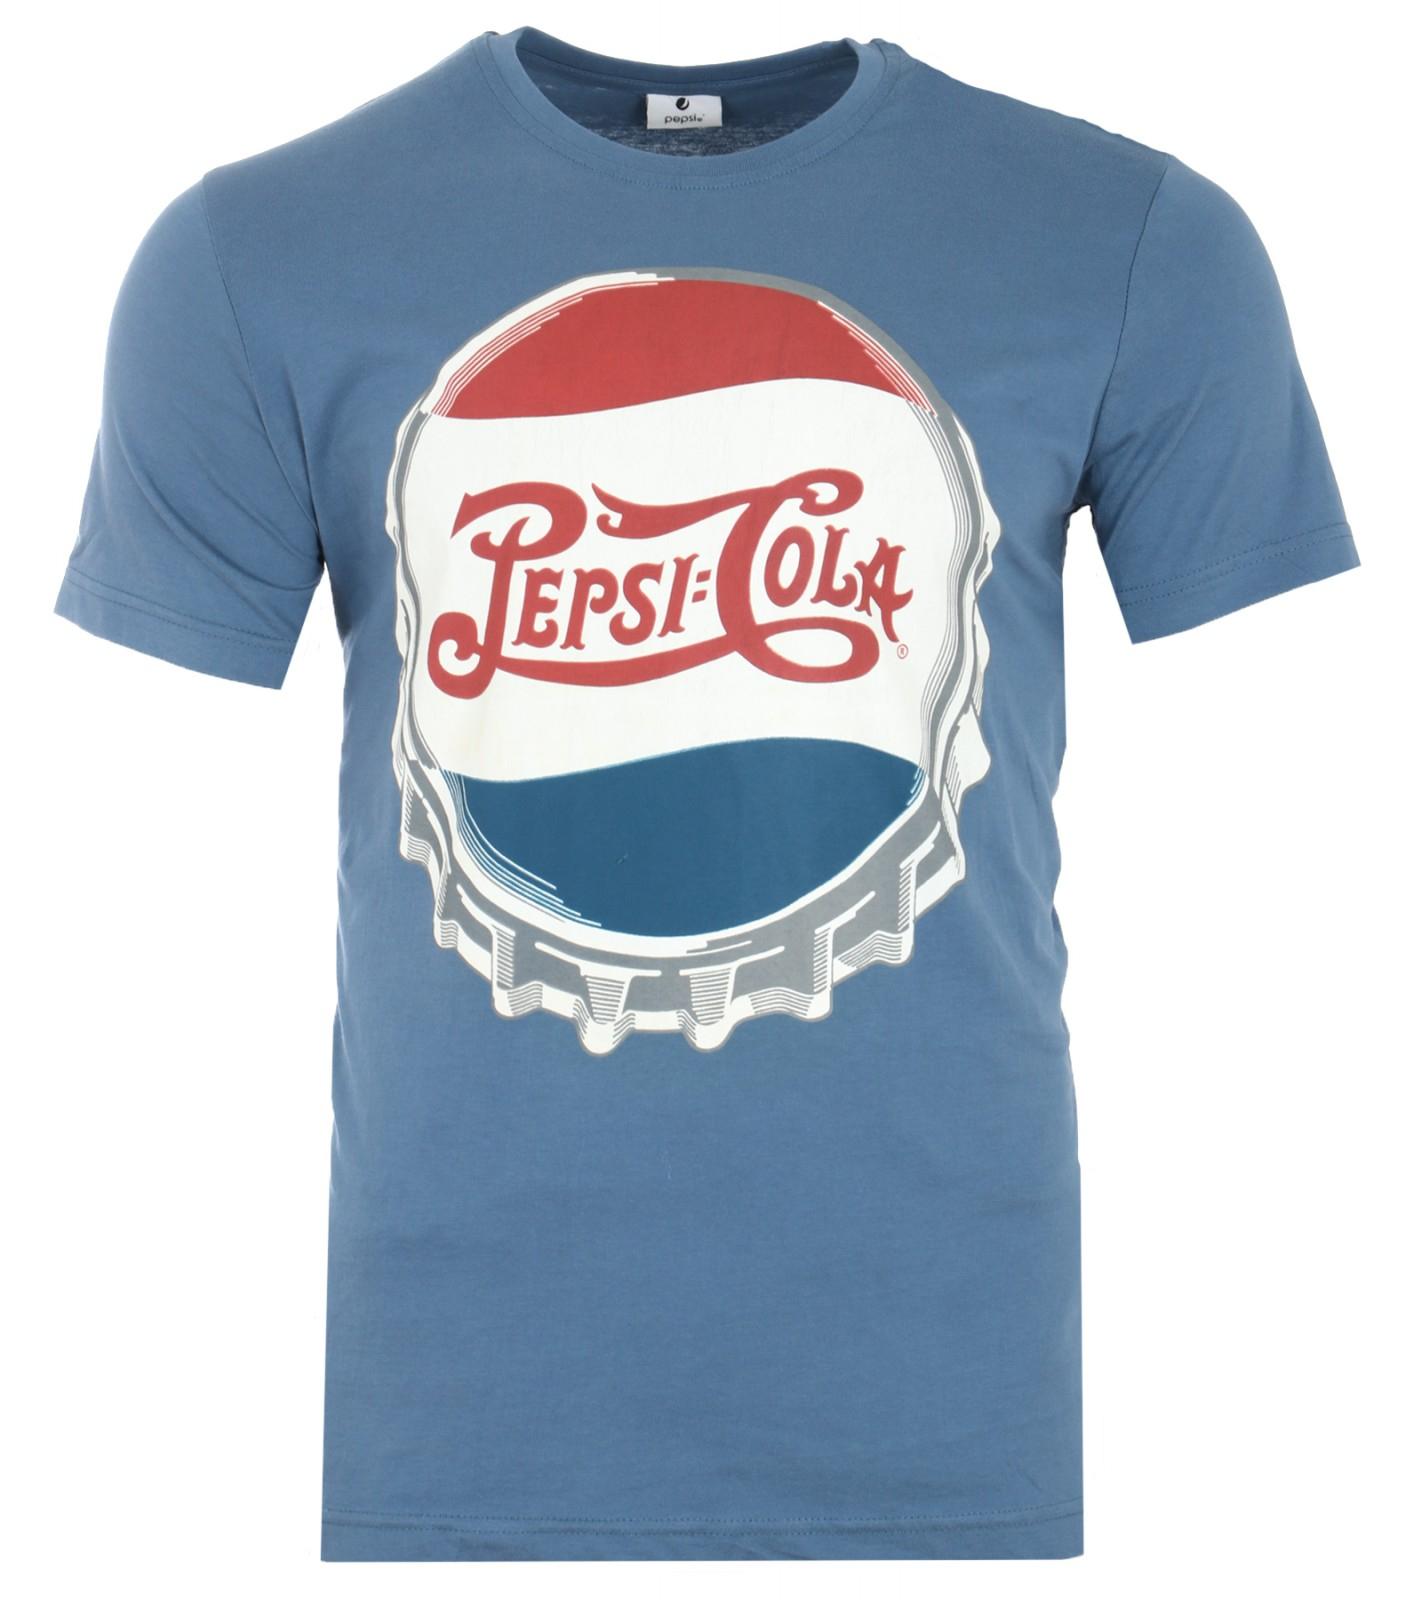 PepsiCo Pepsi Cola Herren T-Shirt gr.S